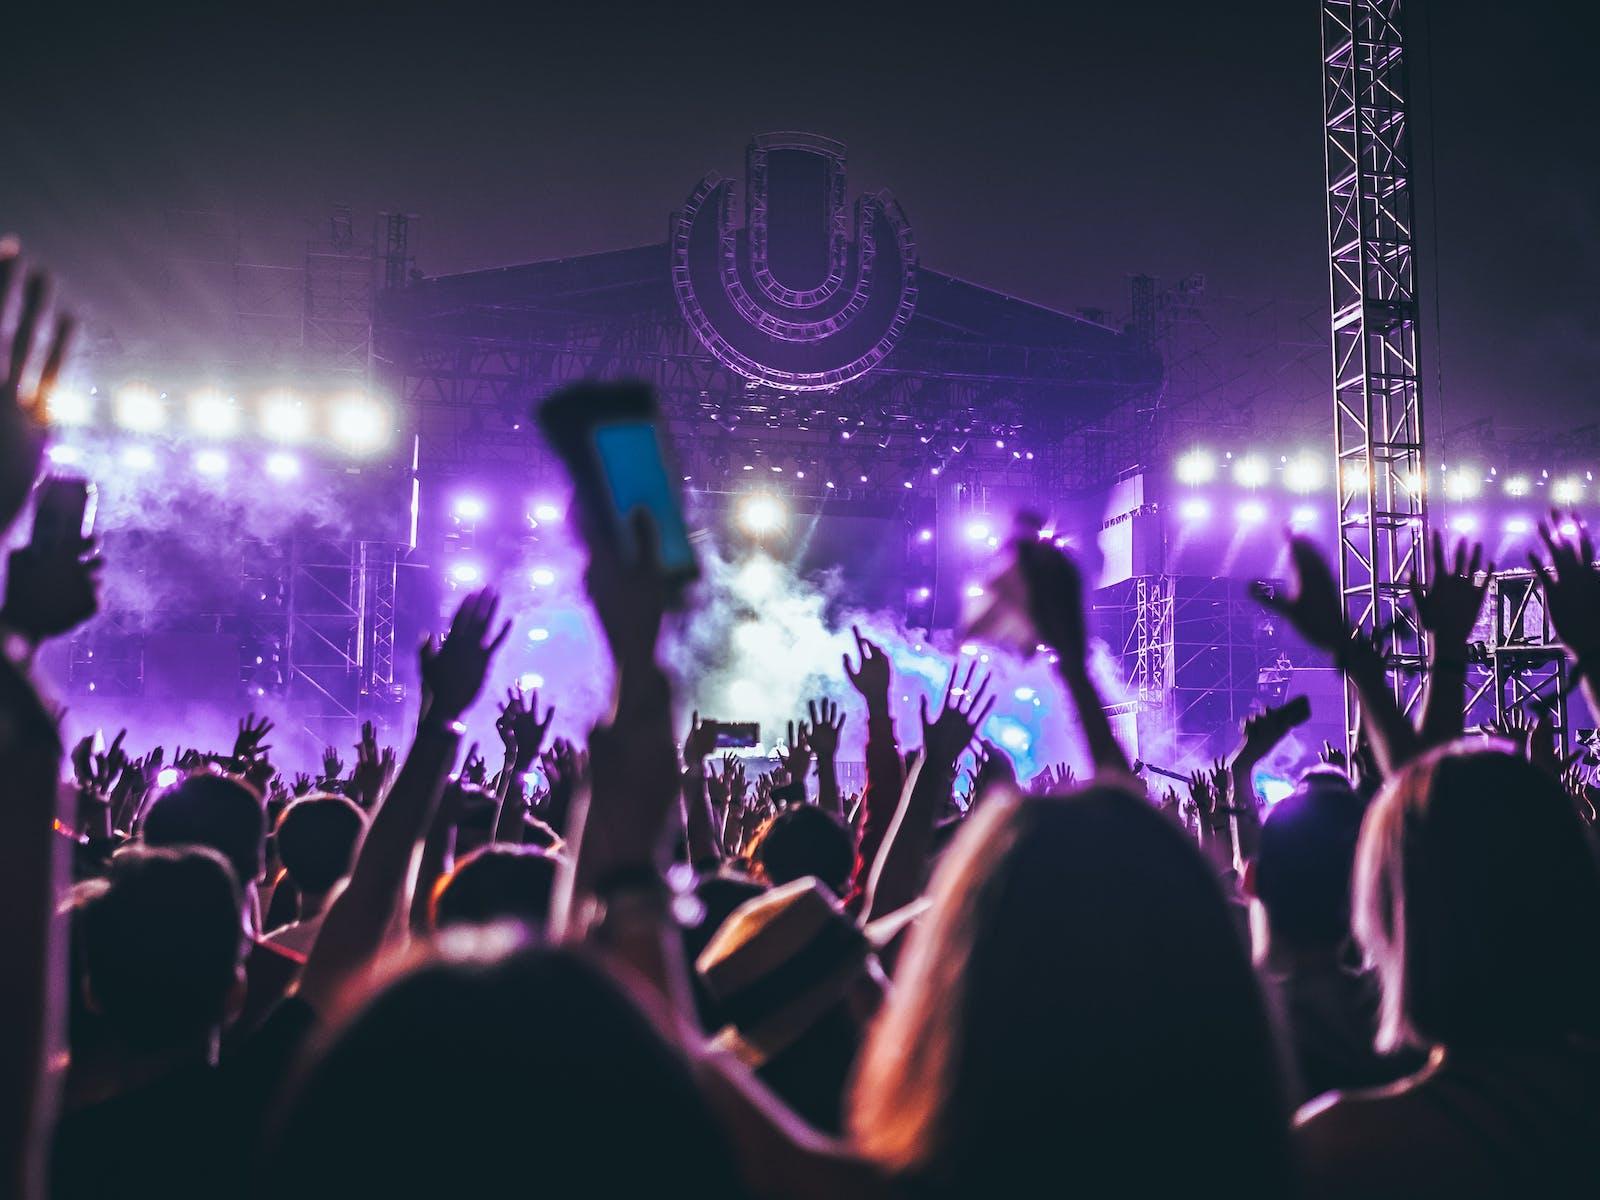 Hangout music festival in Gulf Shores, AL